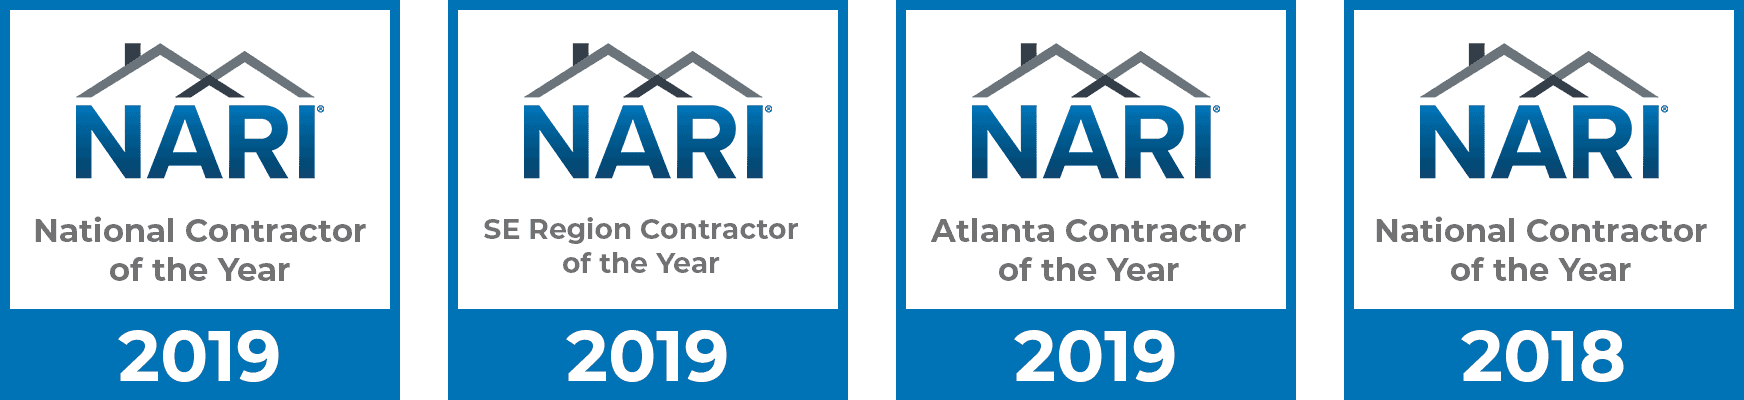 NARI Atlanta Contractor Of The Year